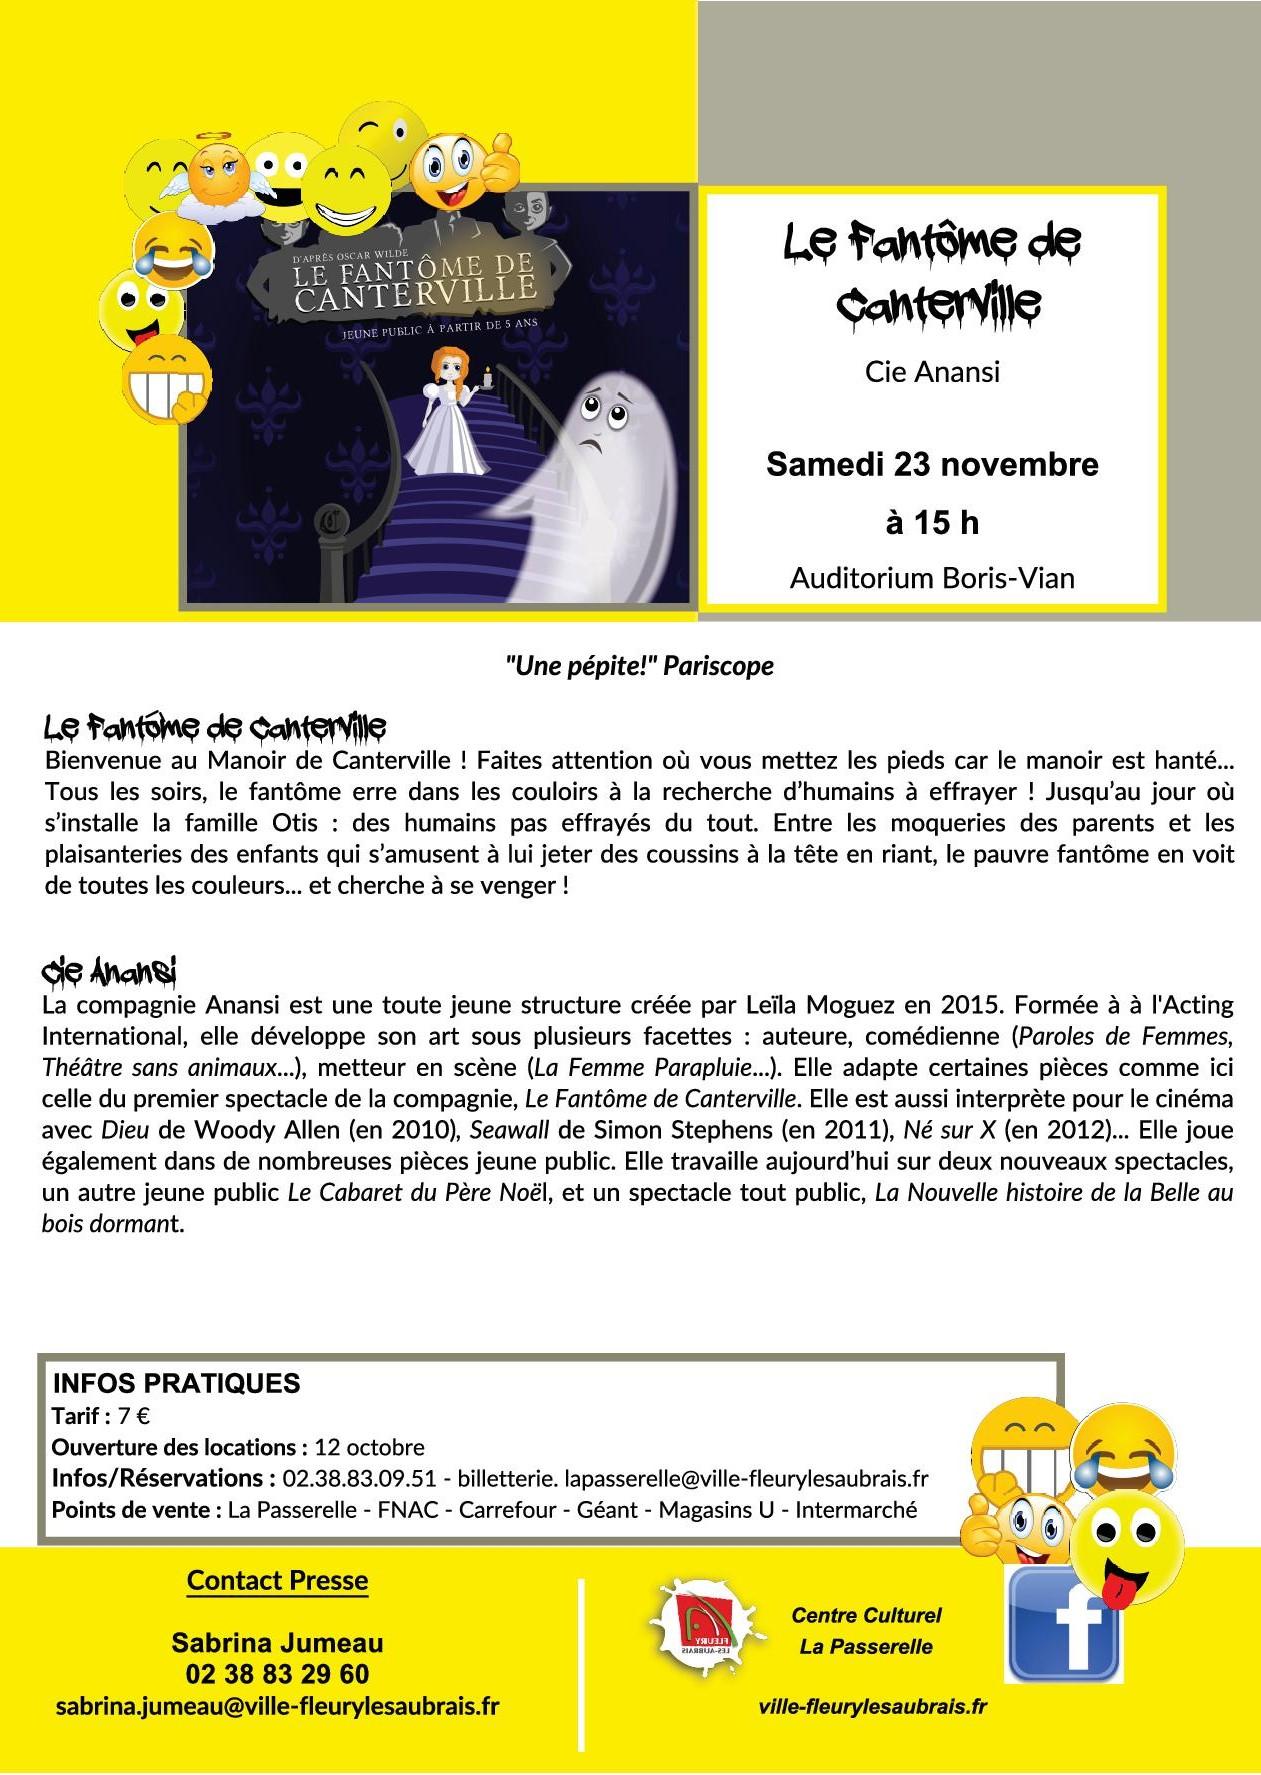 Le fantome de Canterville - 23 novembre.jpg